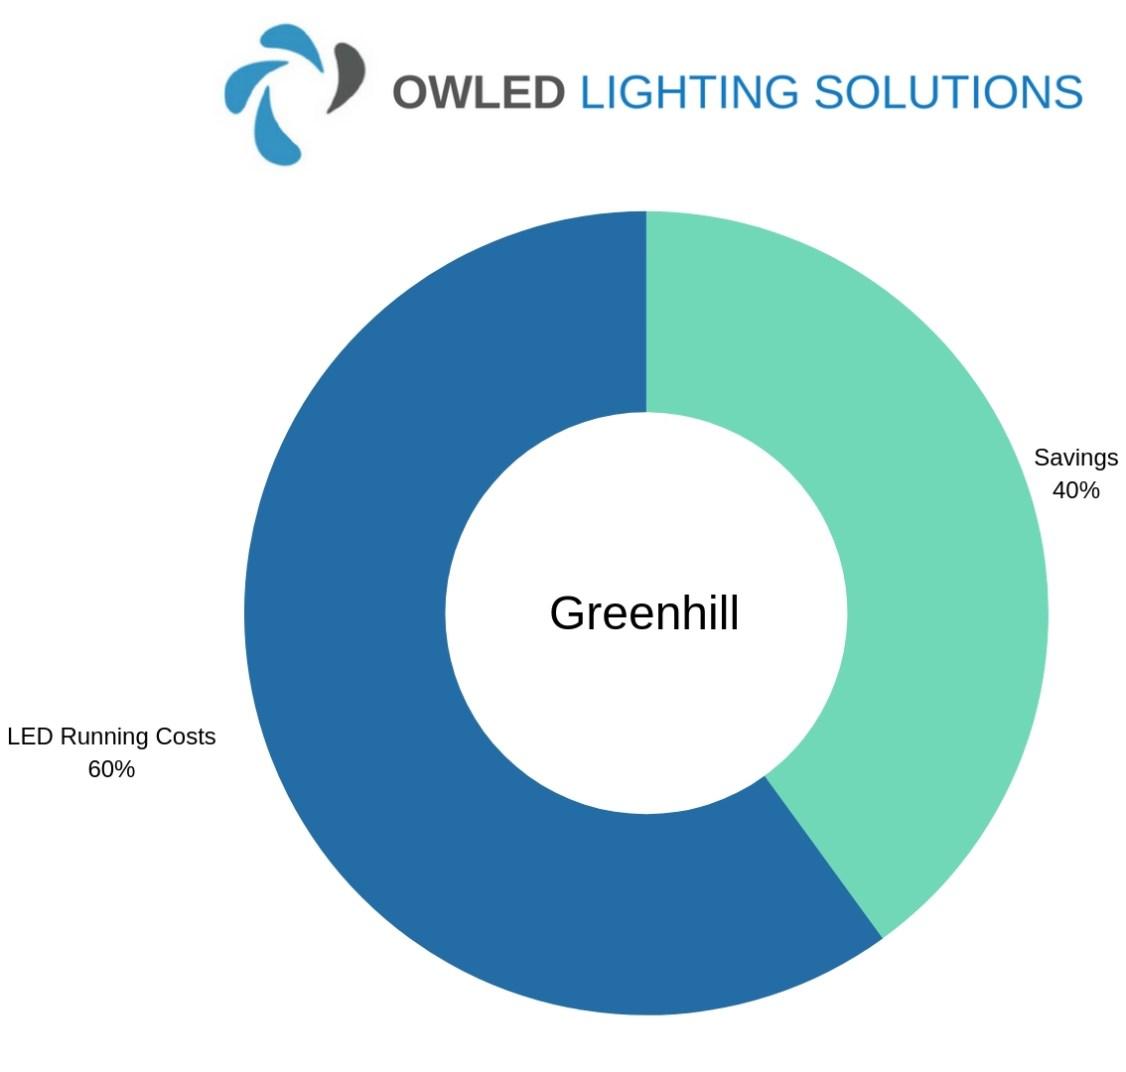 Chart showing Greenhill Motors' LED Garage Lighting Savings